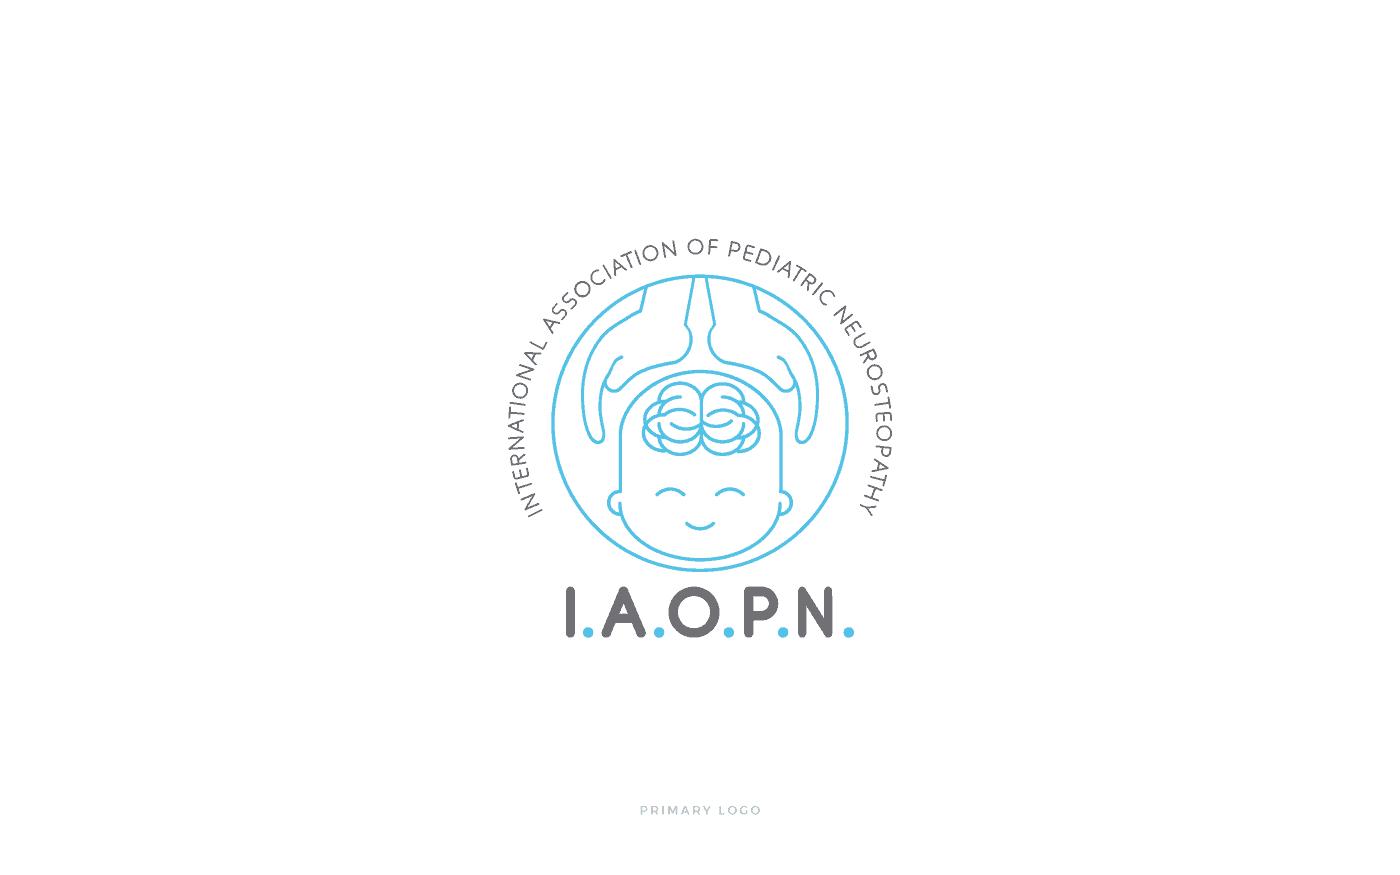 IAOPN Logo primario